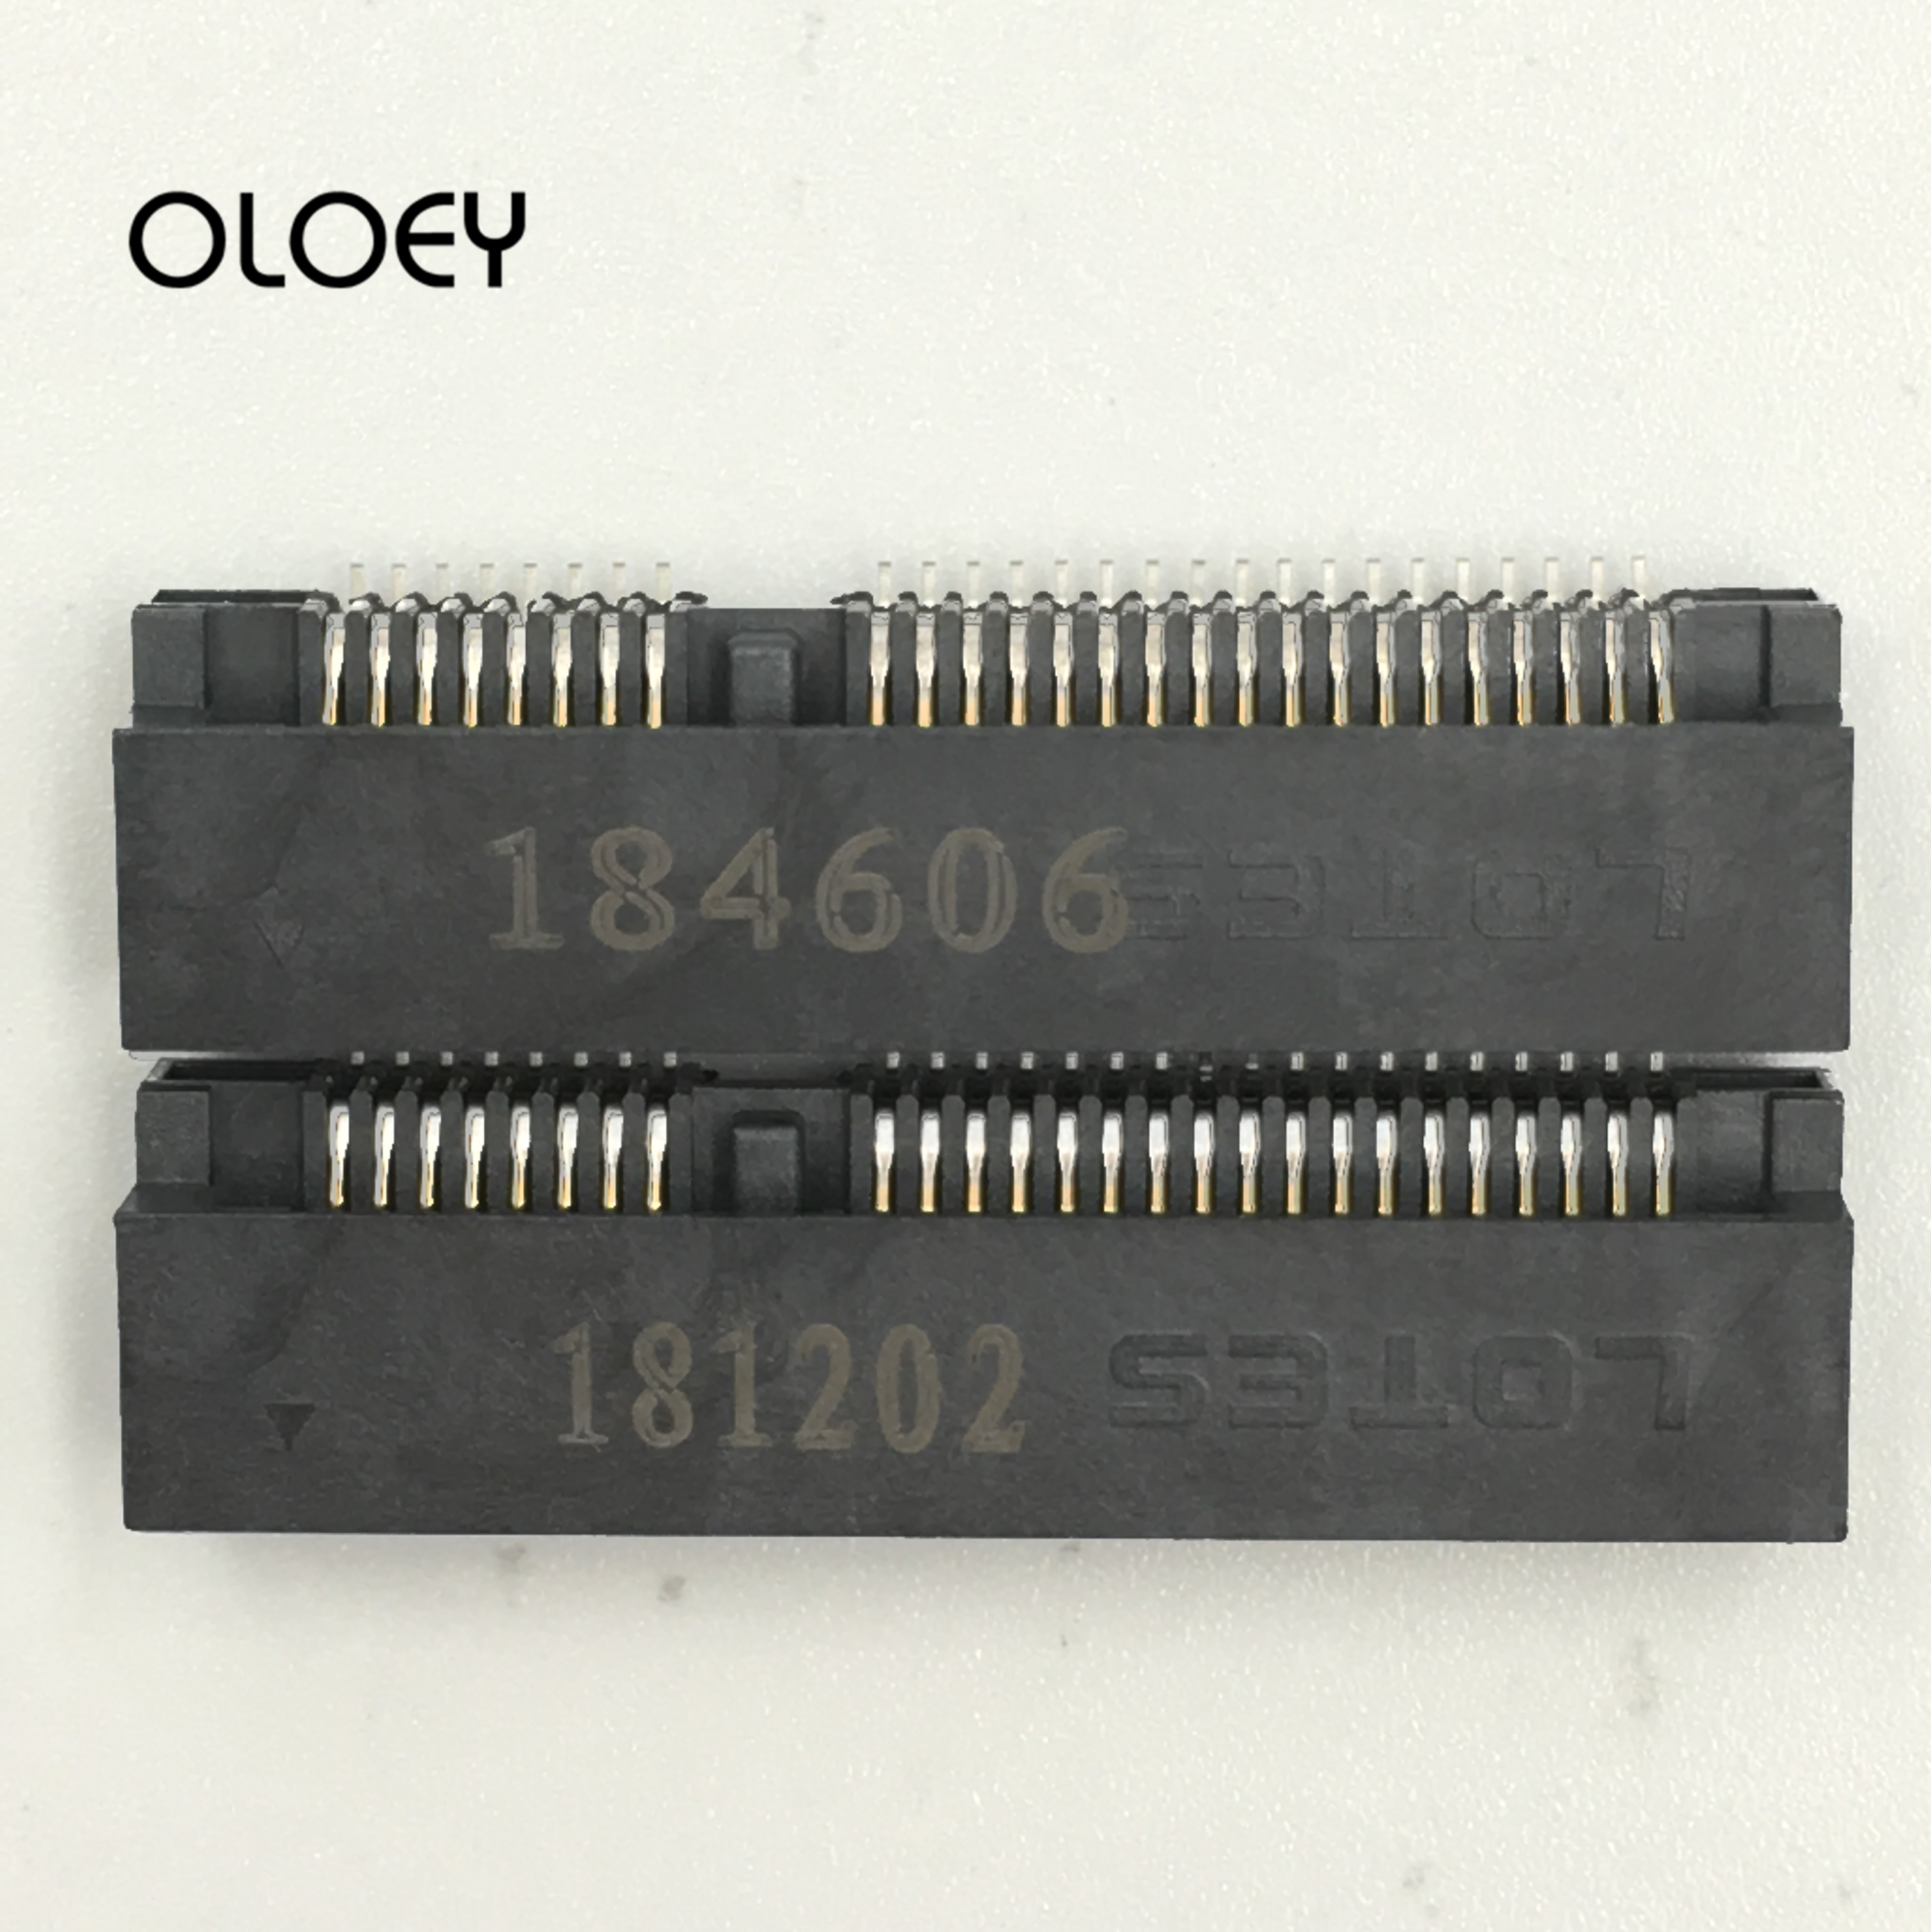 MINI PCIE Msata Connector PCI-E Socket Slot 52P Card Holder 4.0H 5.2H 5.6H 8H For Notebook MiniPCIE